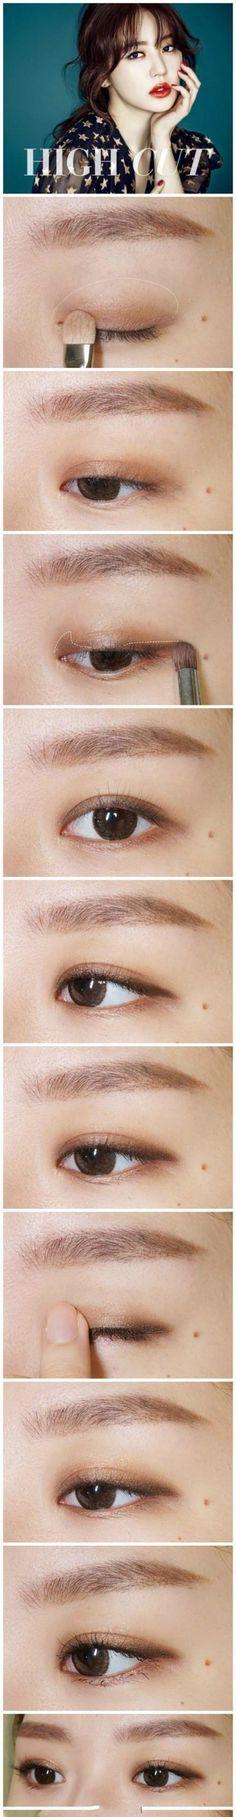 note eyeshadow placement Más